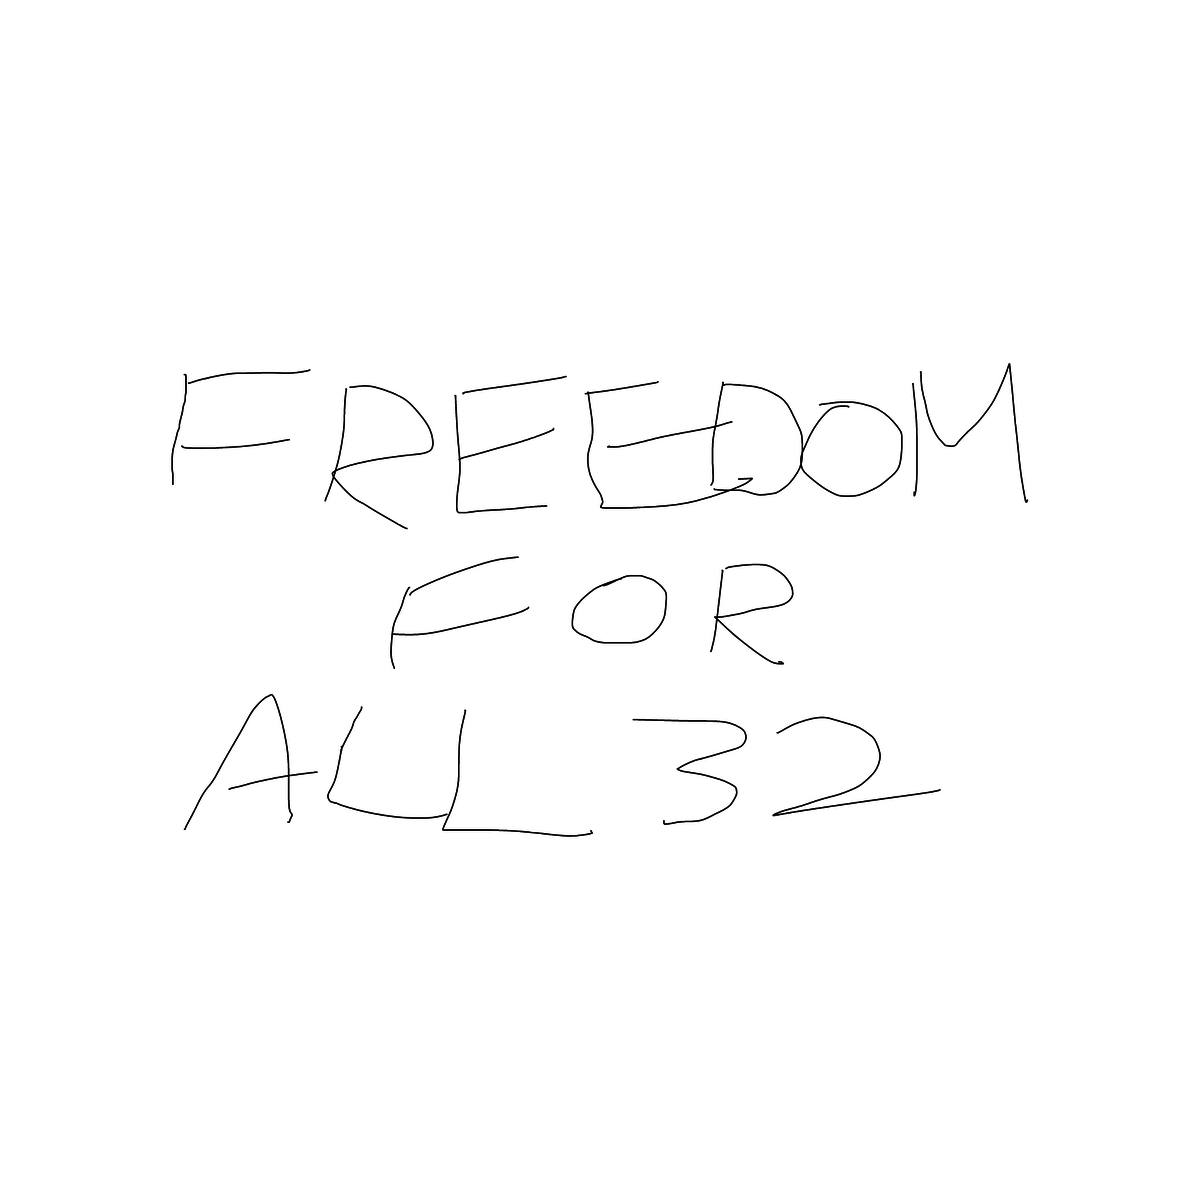 BAAAM drawing#5390 lat:54.6539726257324200lng: -6.5334334373474120